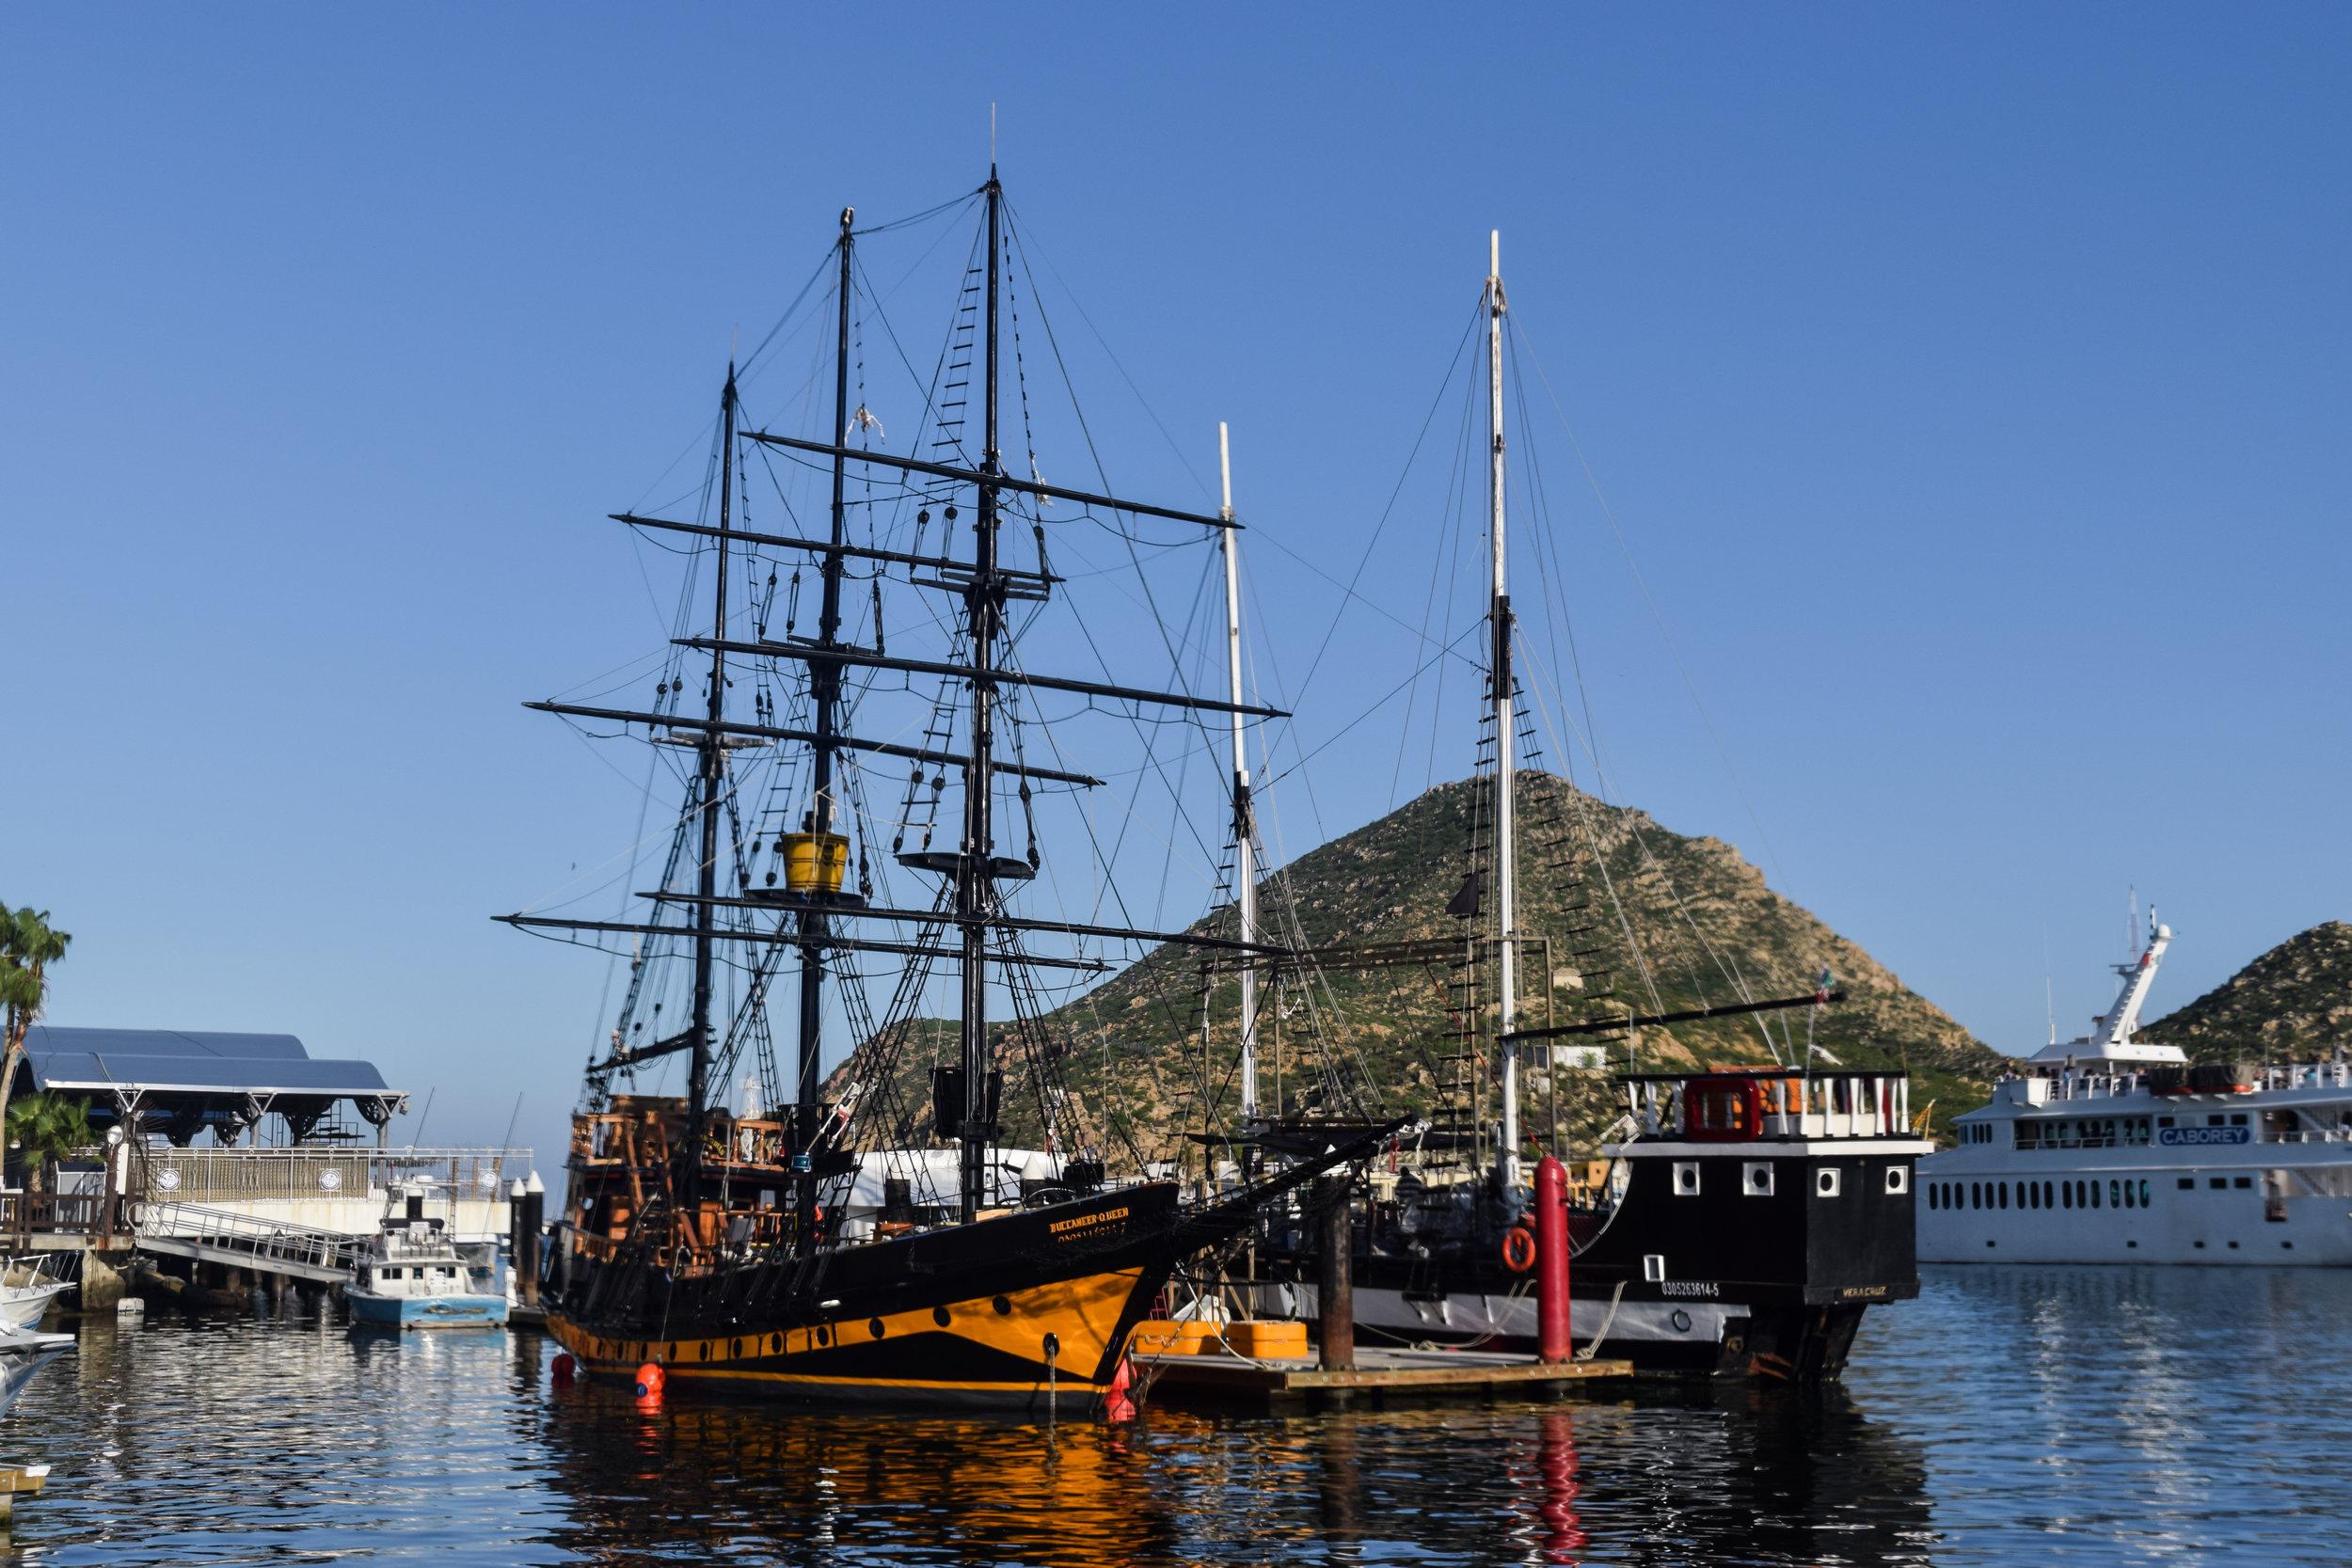 Edited Pirate Ship.jpg